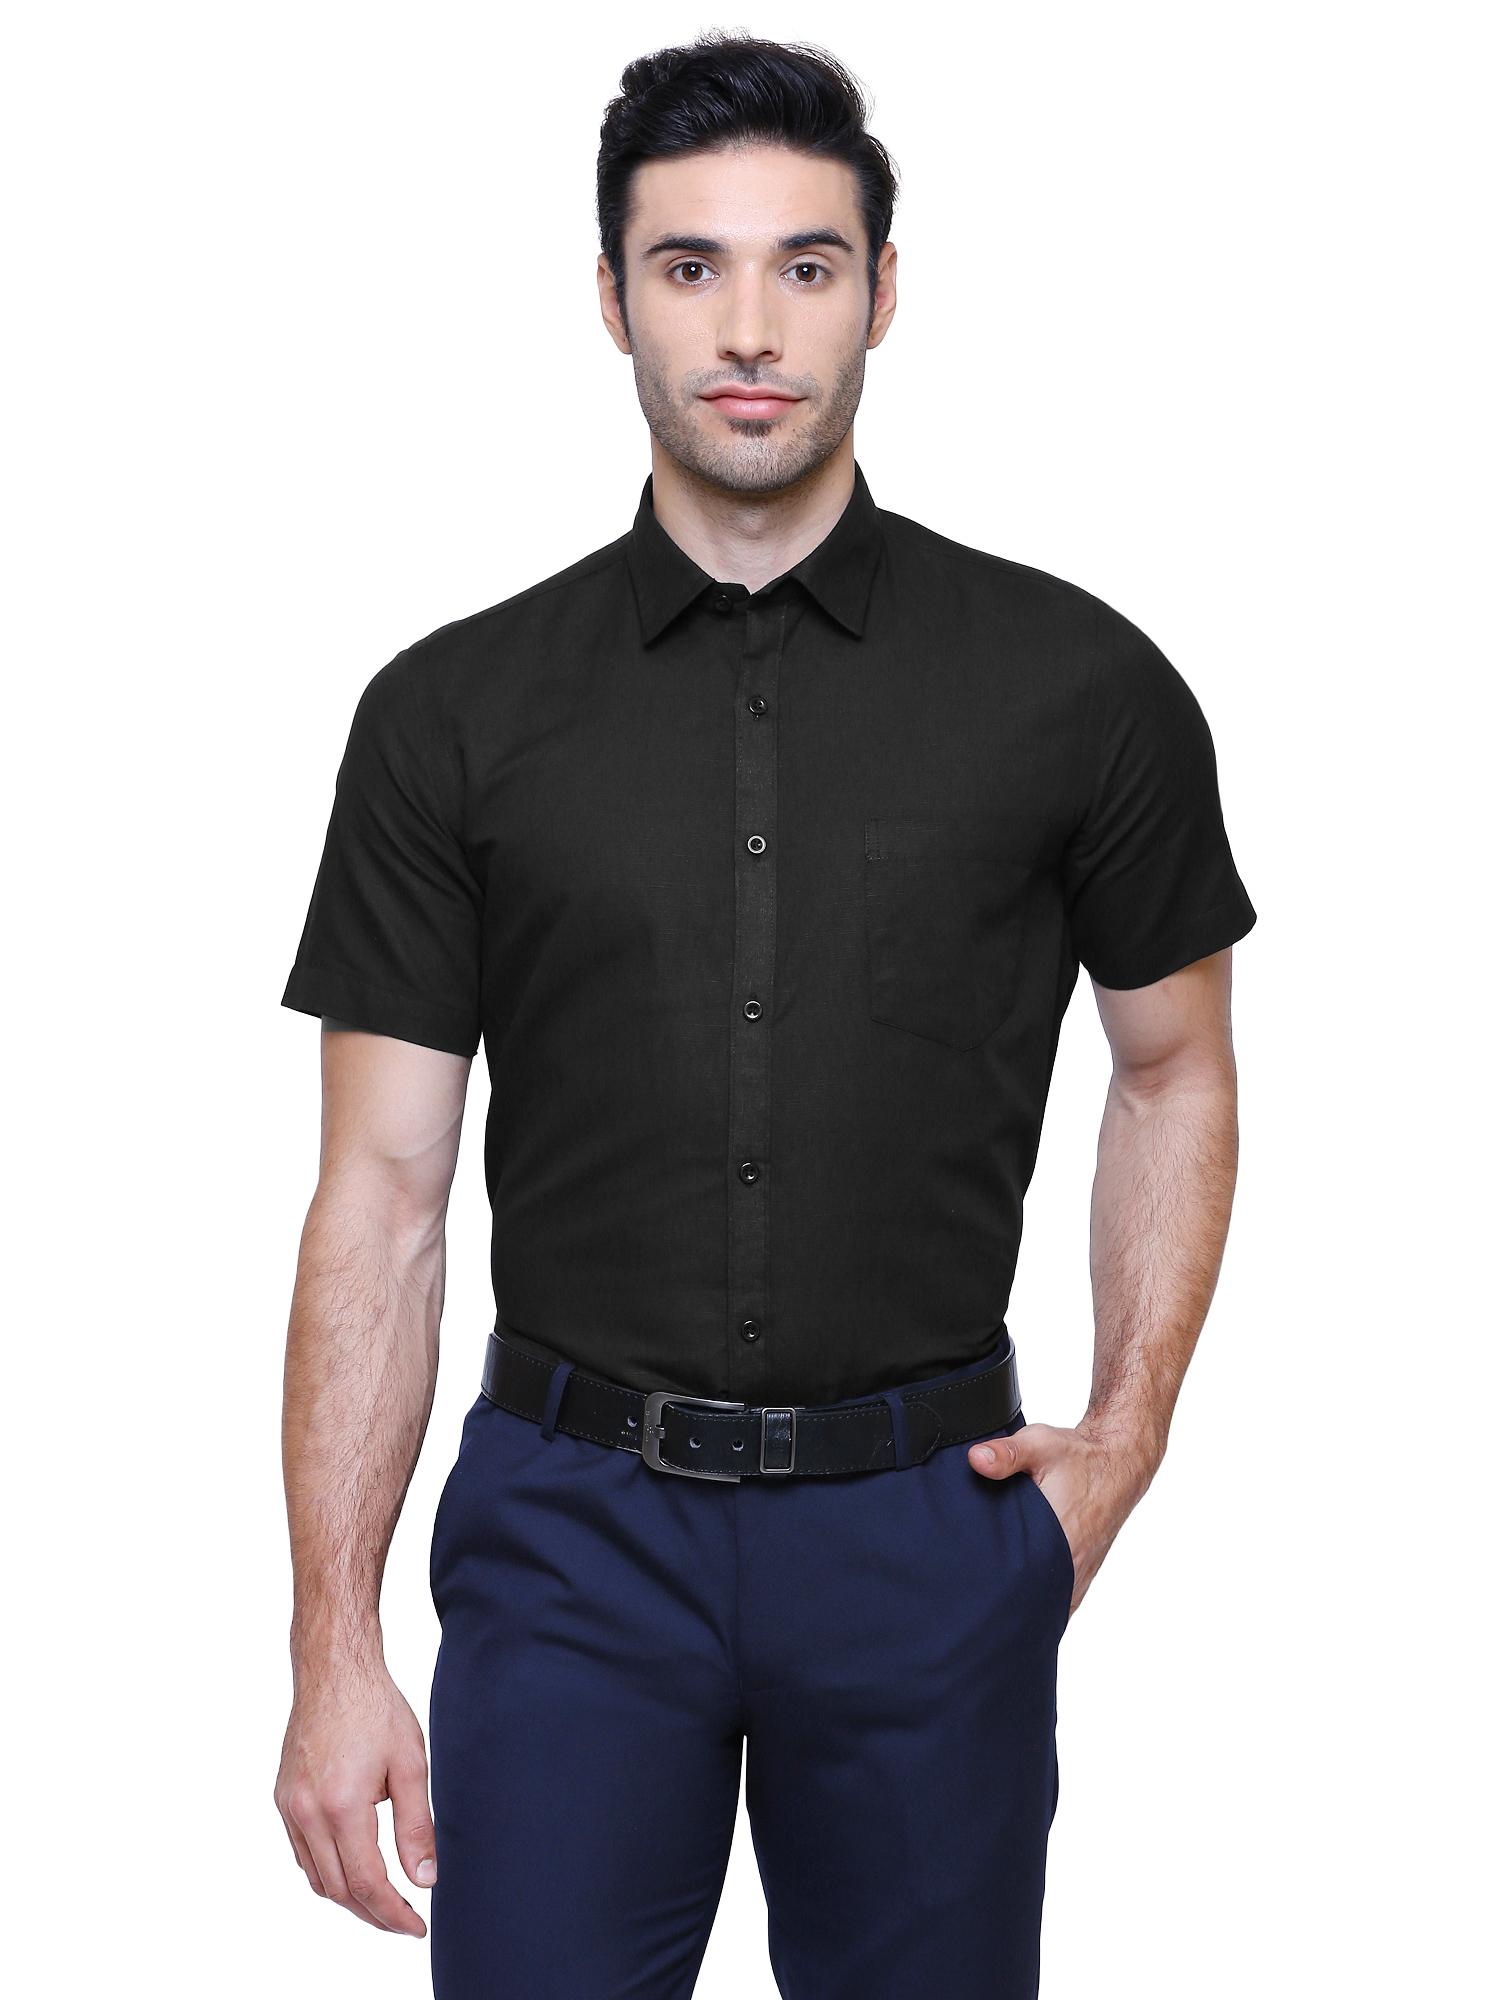 Southbay | Southbay Men's Black Half Sleeve Linen Cotton Formal Shirt-SBCLHS230BK